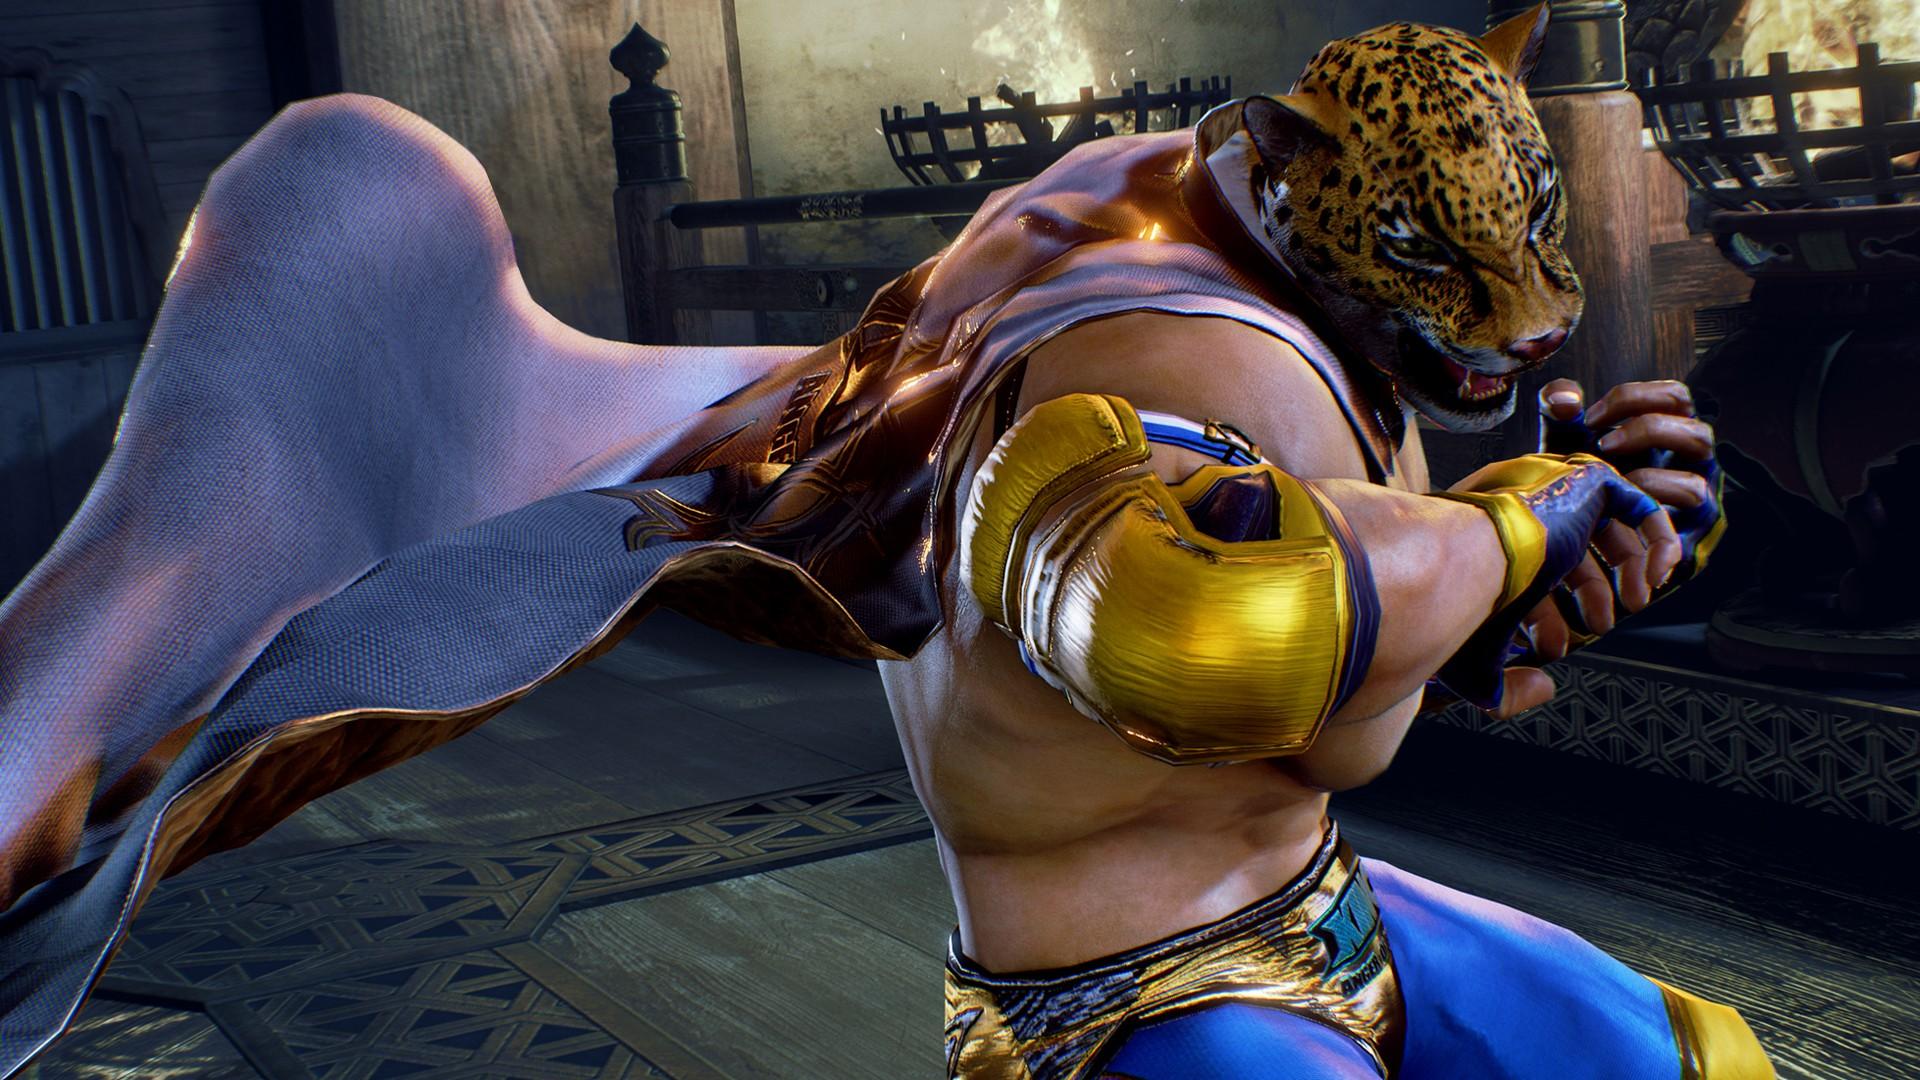 Tekken 7 King Wallpaper DESKTOP BACKGROUNDS Best Wallpapers HQ 1920x1080